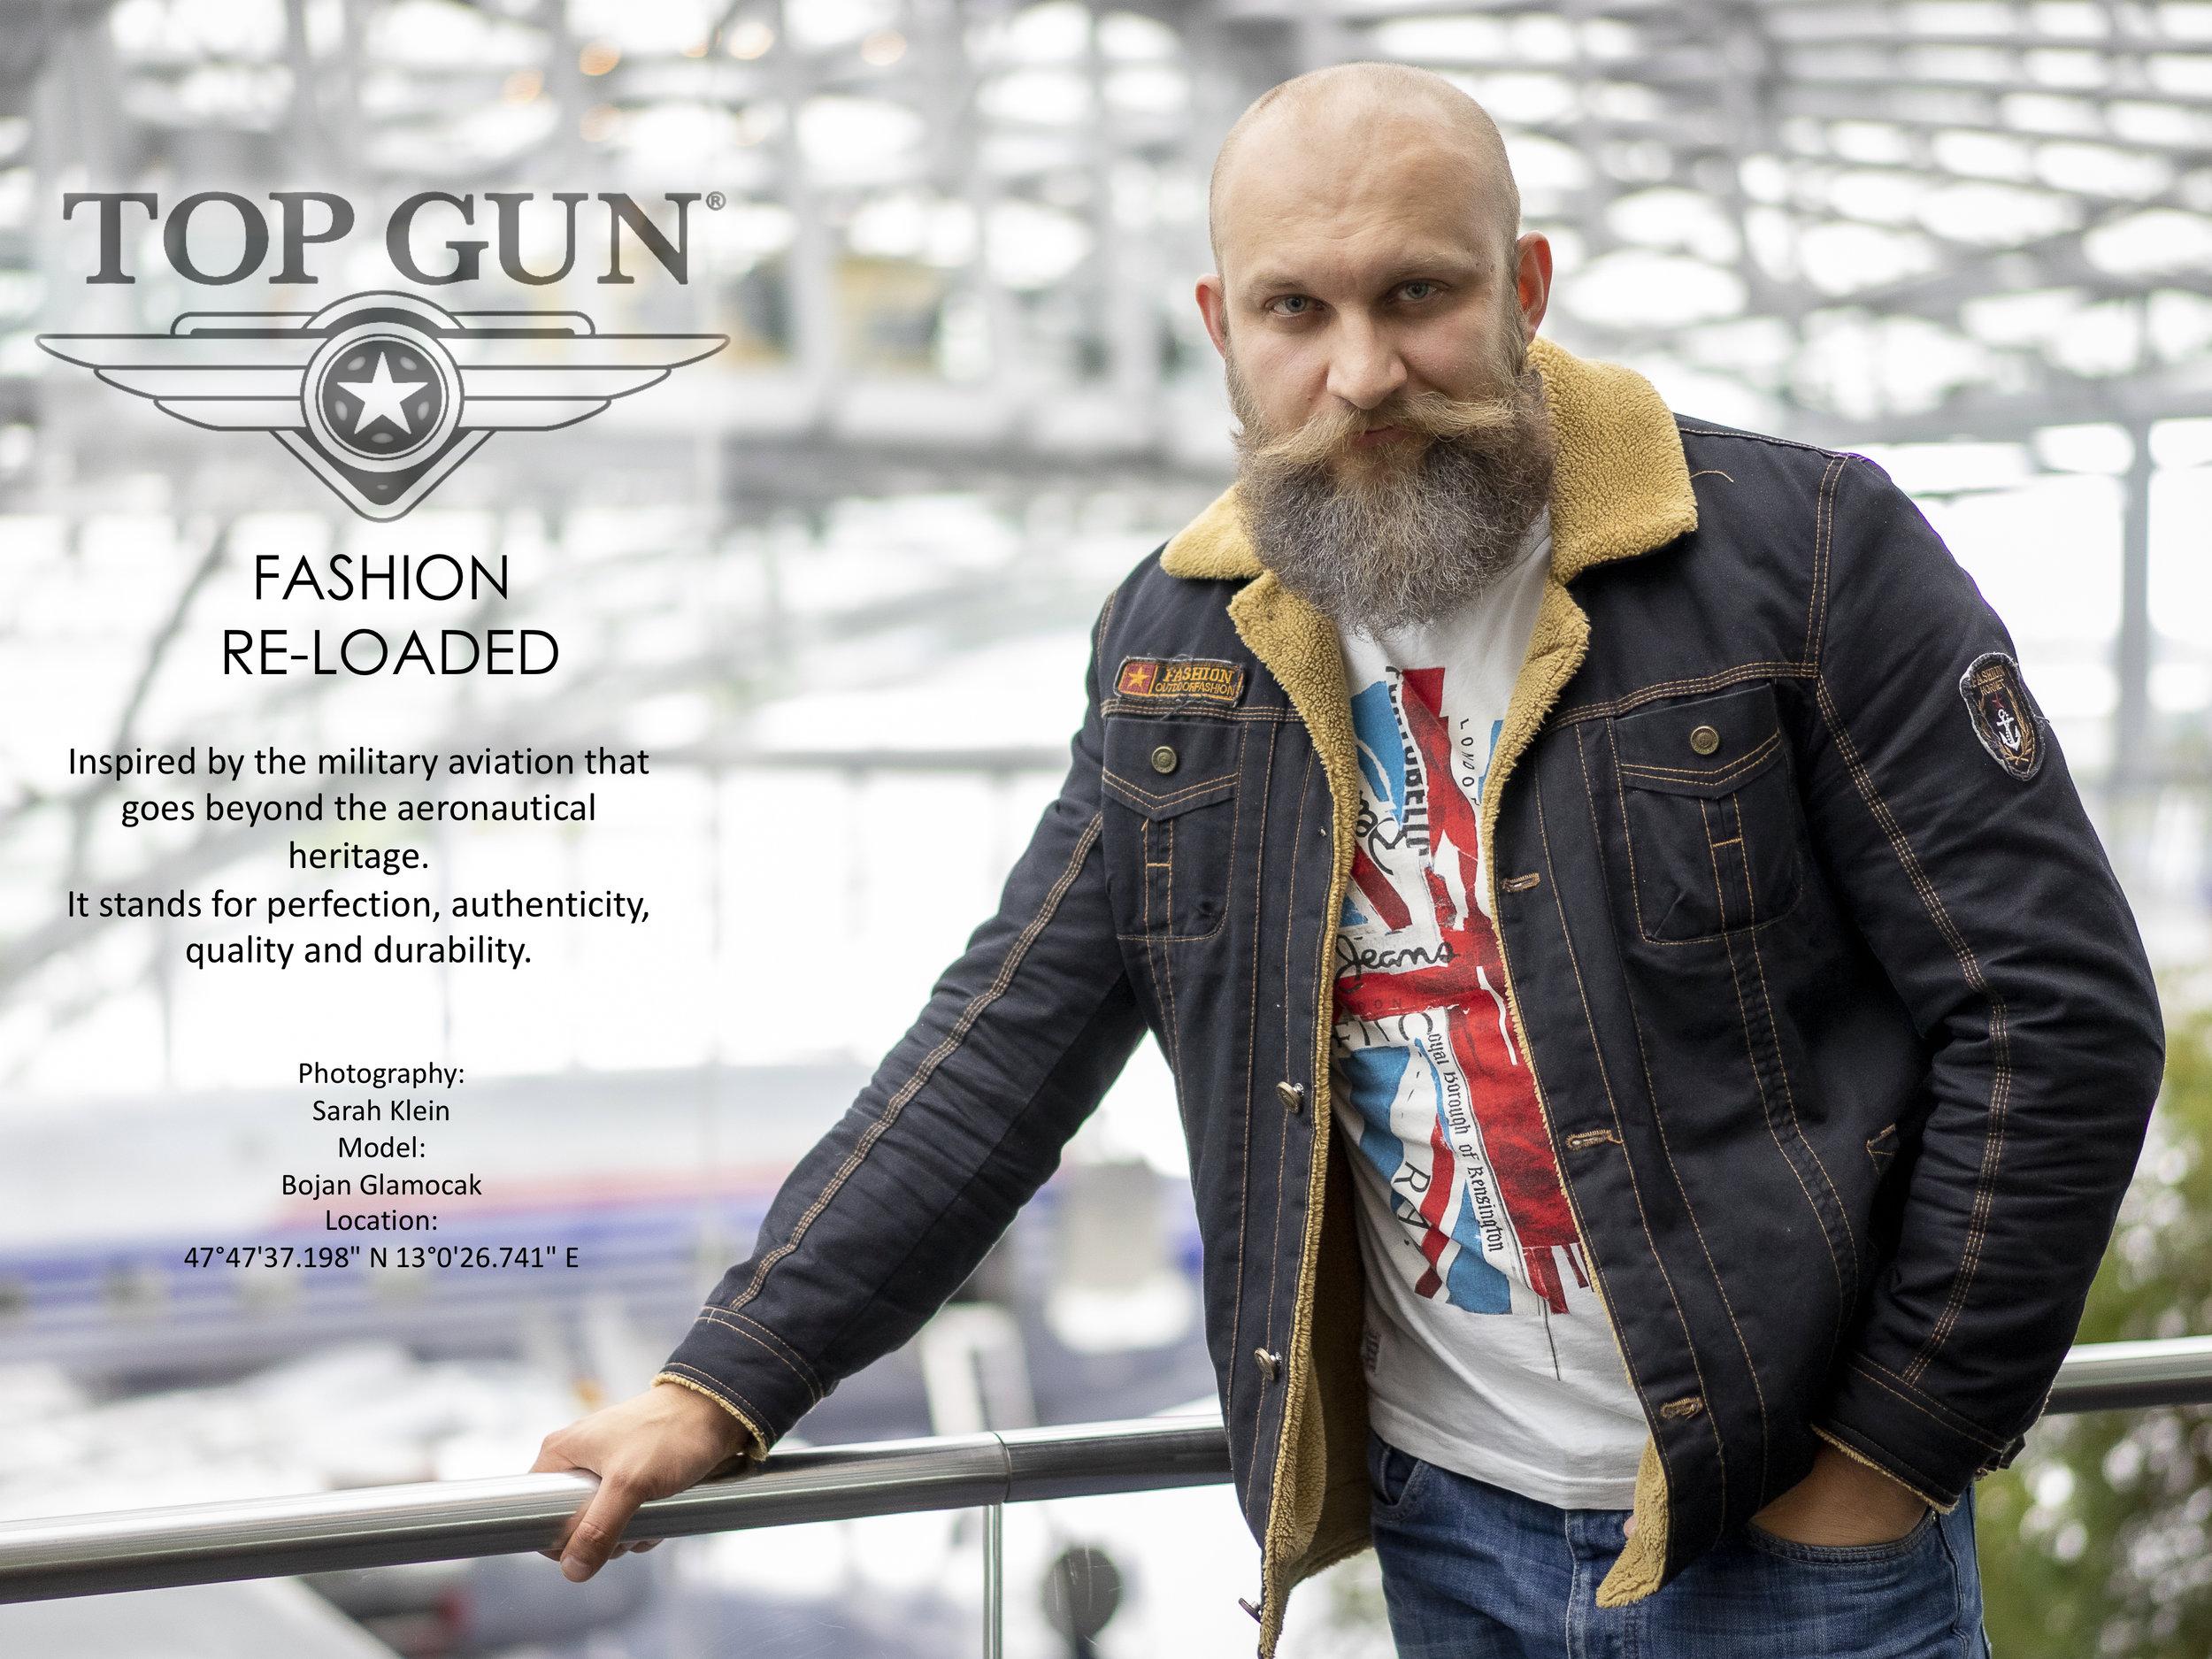 Top Gun Fashion - Weiche Kante 01 exp Kopie.jpg